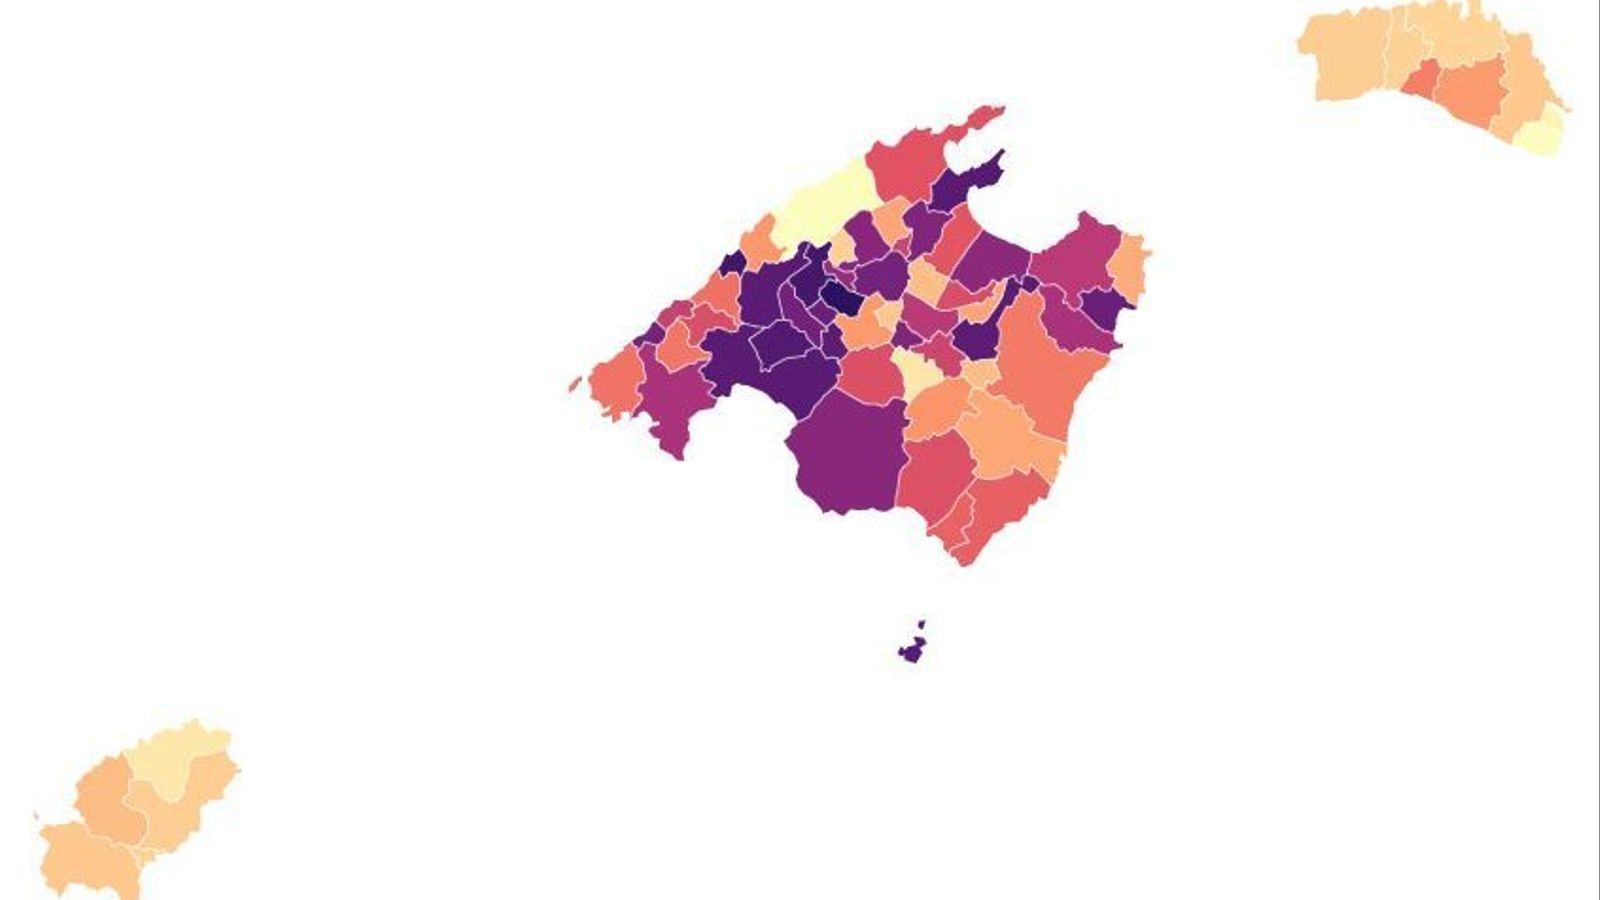 Mapa de les Balears per incidència acumulada de coronavirus a 7 dies.